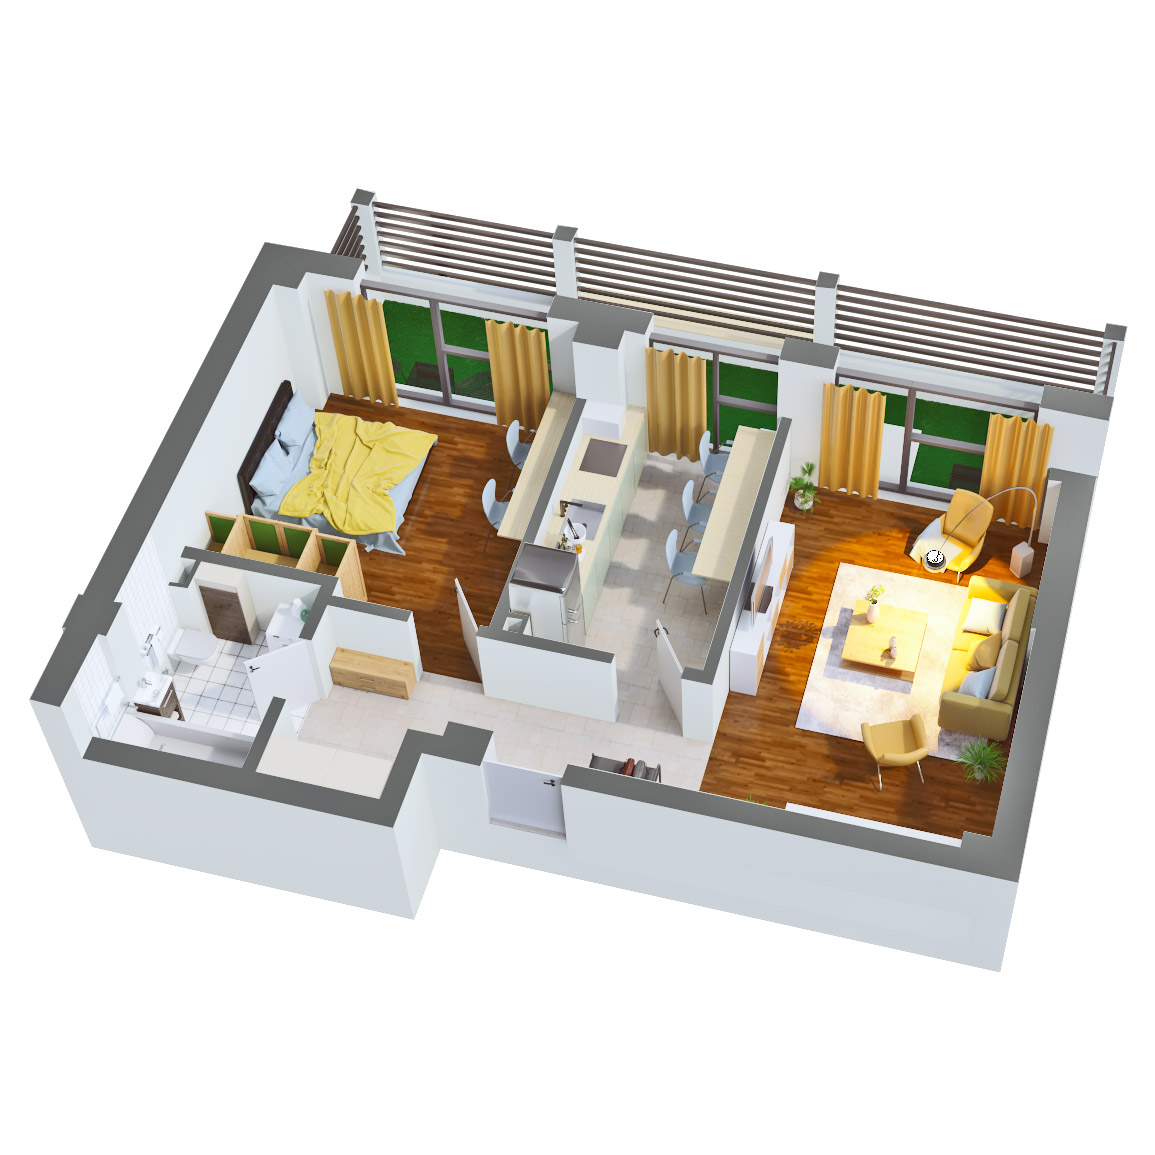 Apartament 2 camere de vanzare Bucuresti - Catedral Residence - Marriott, Piata Unirii, 13 Septembrie, Izvor - Tip 5 - T2 - C